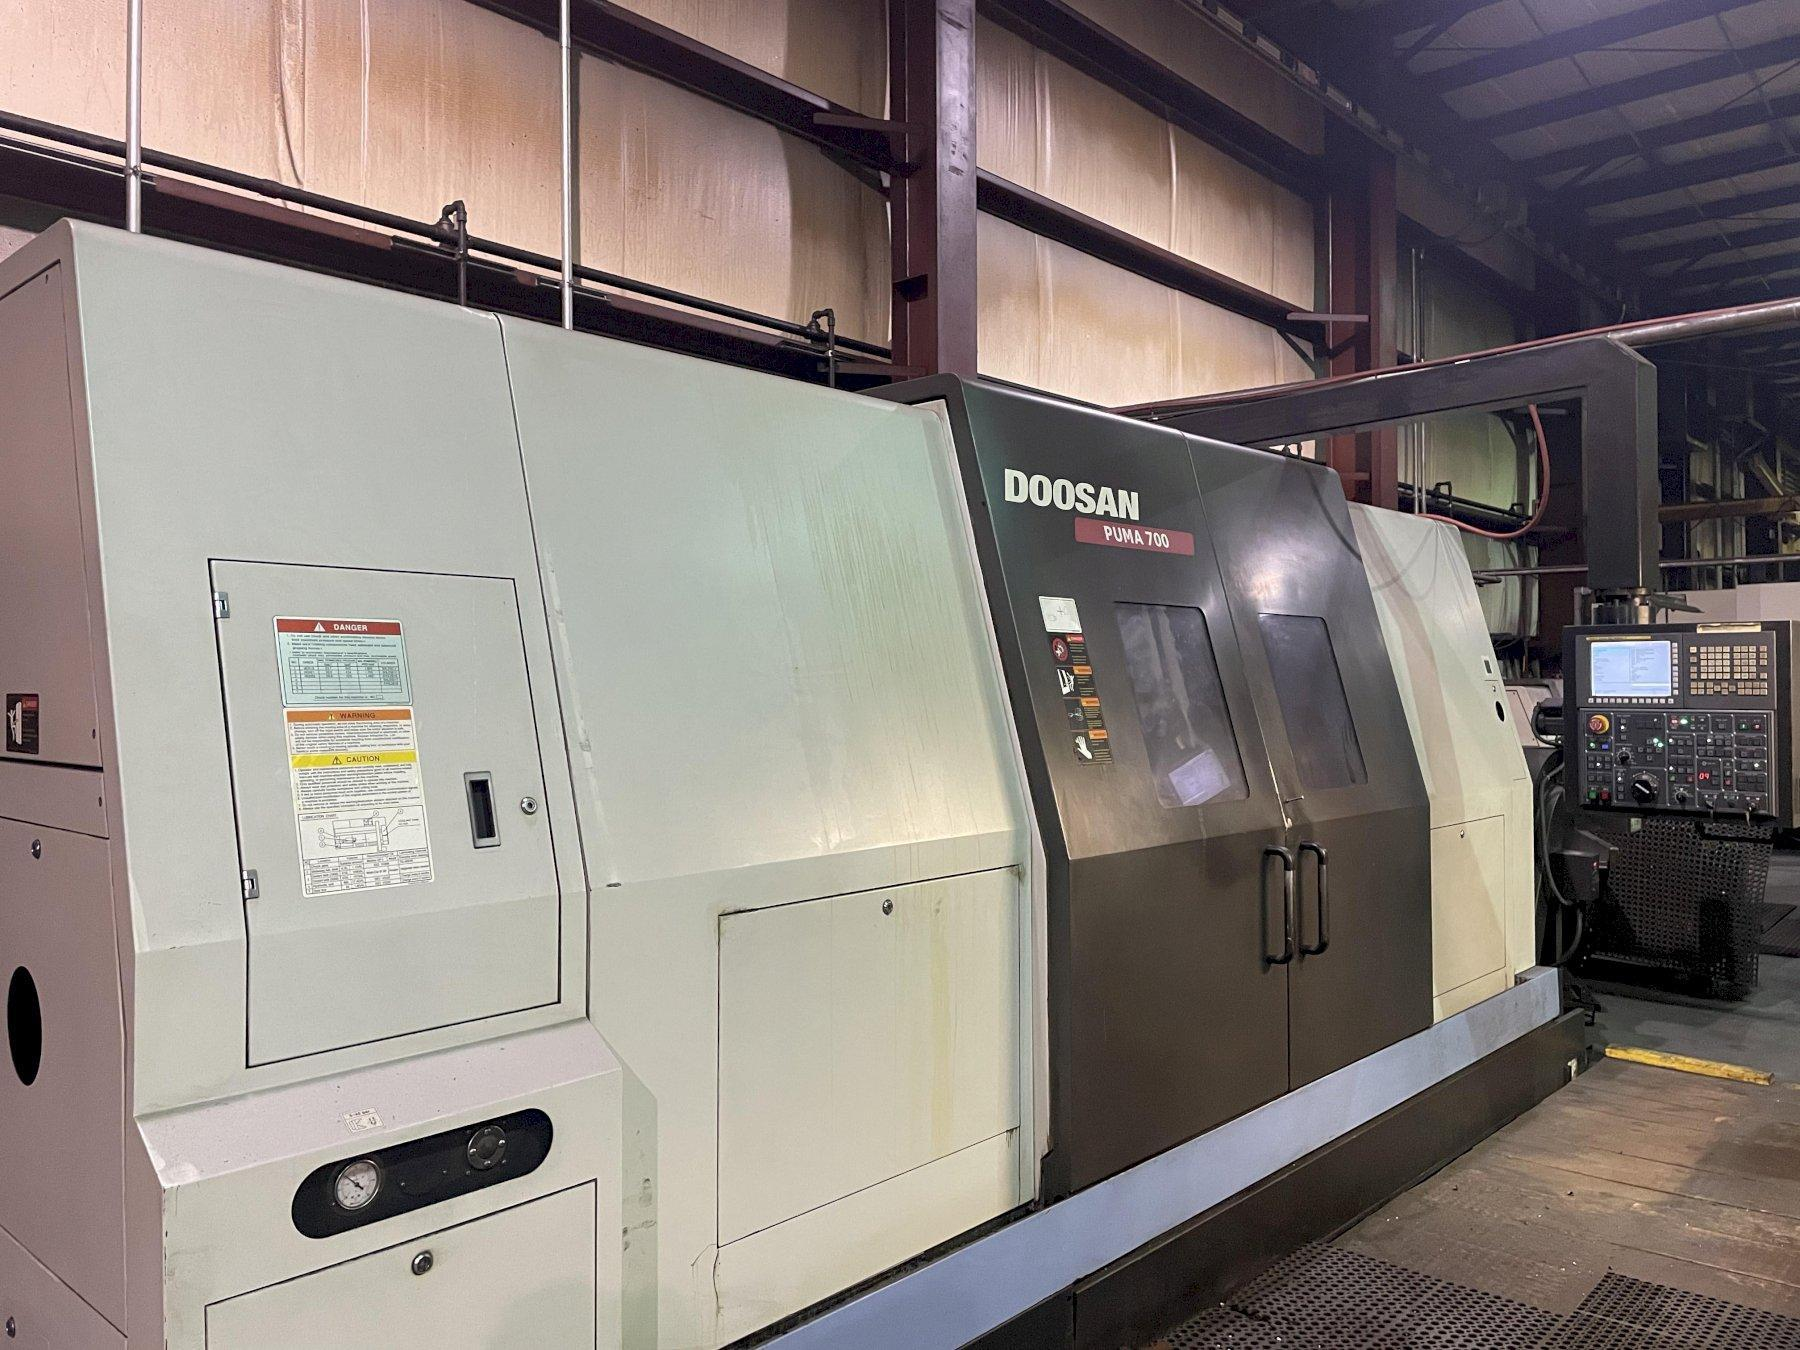 2007 Doosan Puma 700 CNC Lathe - 2 Available